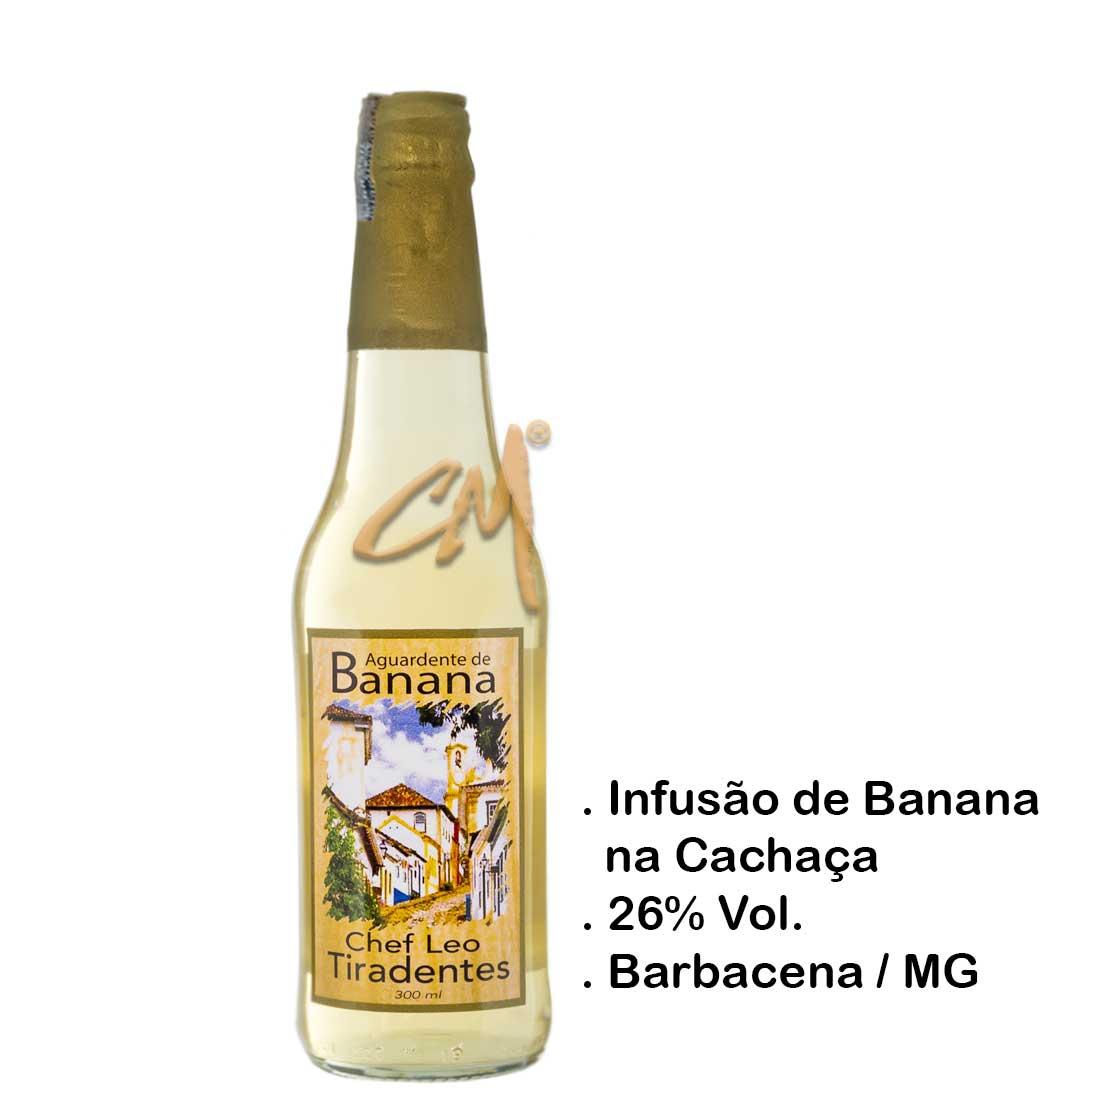 Infusão Bananinha Chef Leo 300 ml (Barbacena - MG)